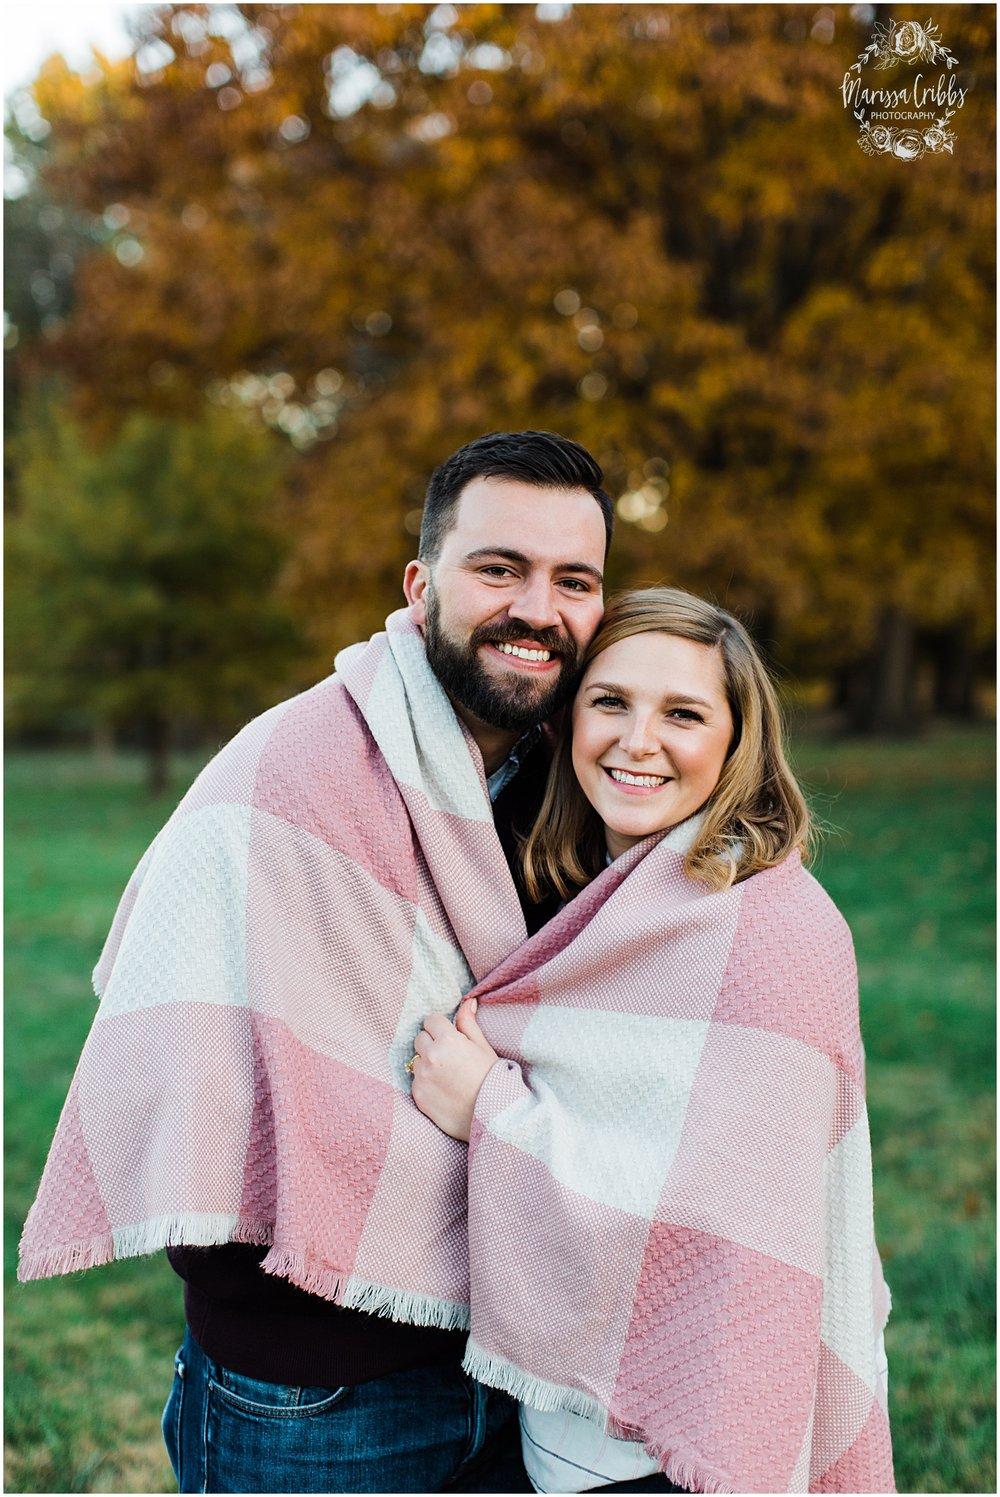 KAM & MARY ENGAGEMENT | MARISSA CRIBBS PHOTOGRAPHY_4037.jpg